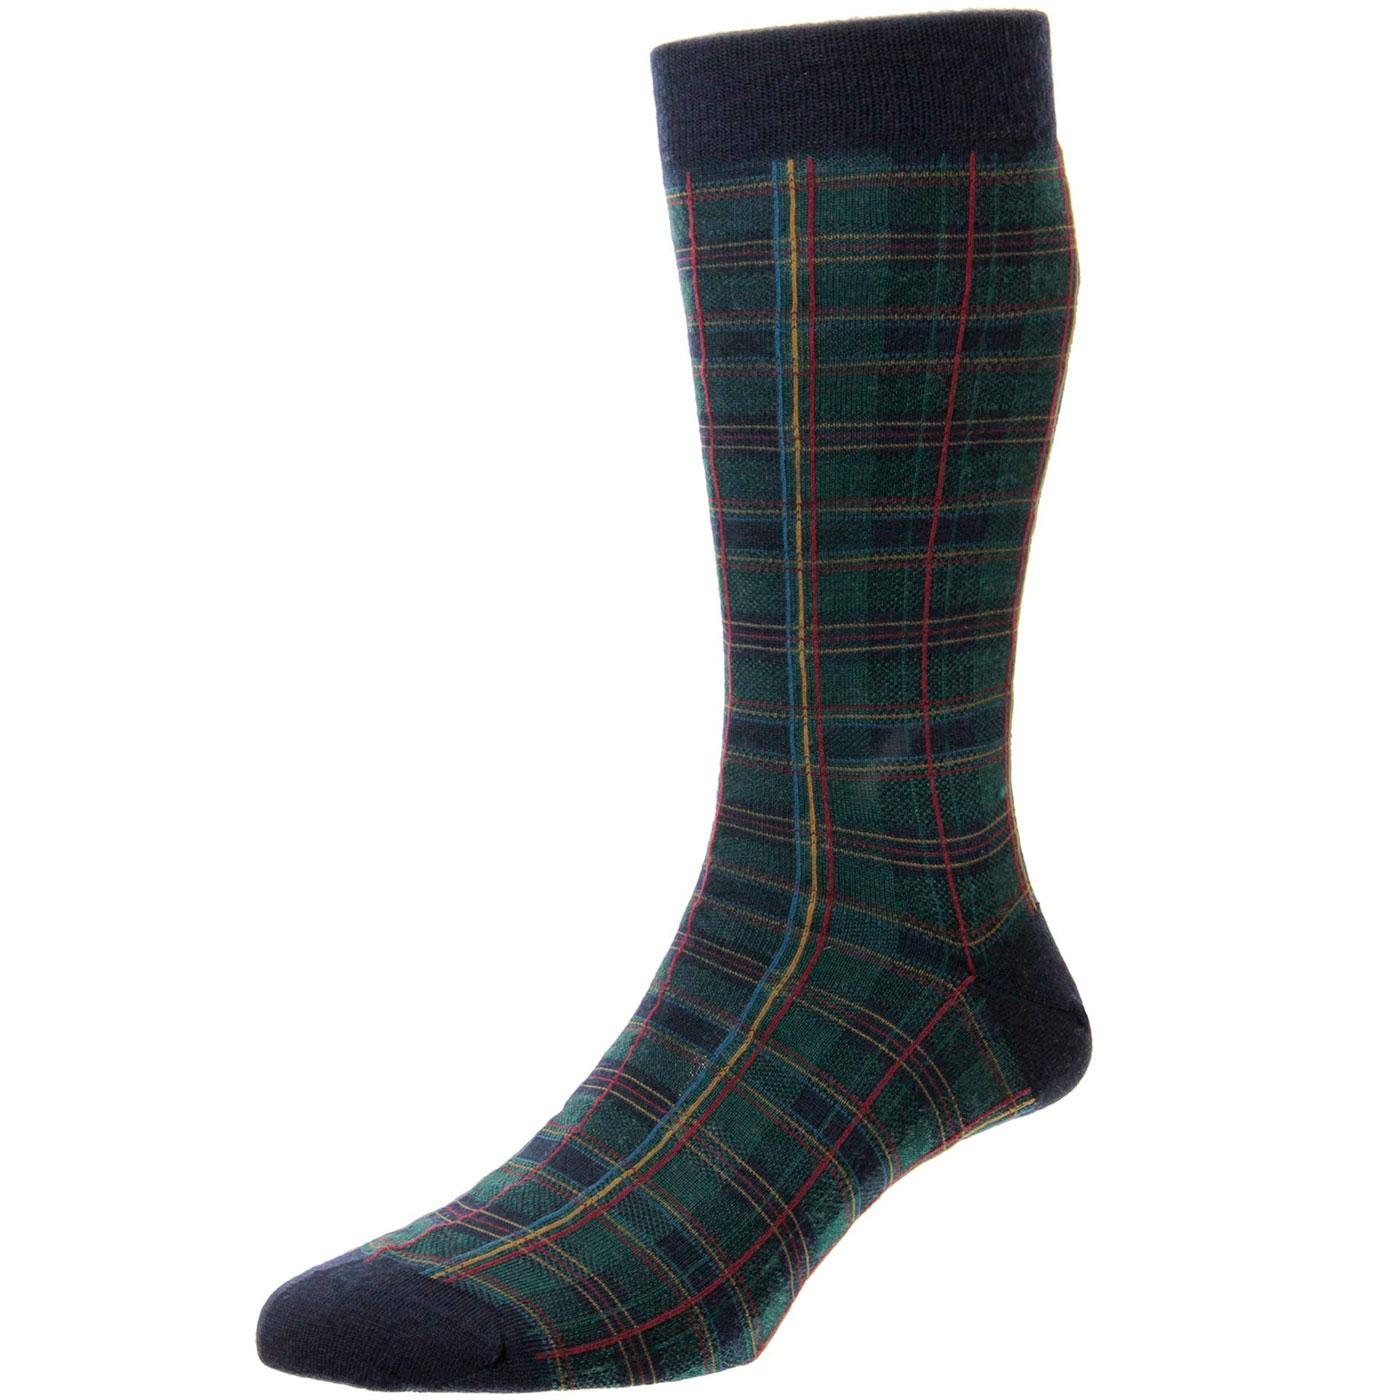 + Tarlton PANTHERELLA Retro Mod Tartan Socks NAVY